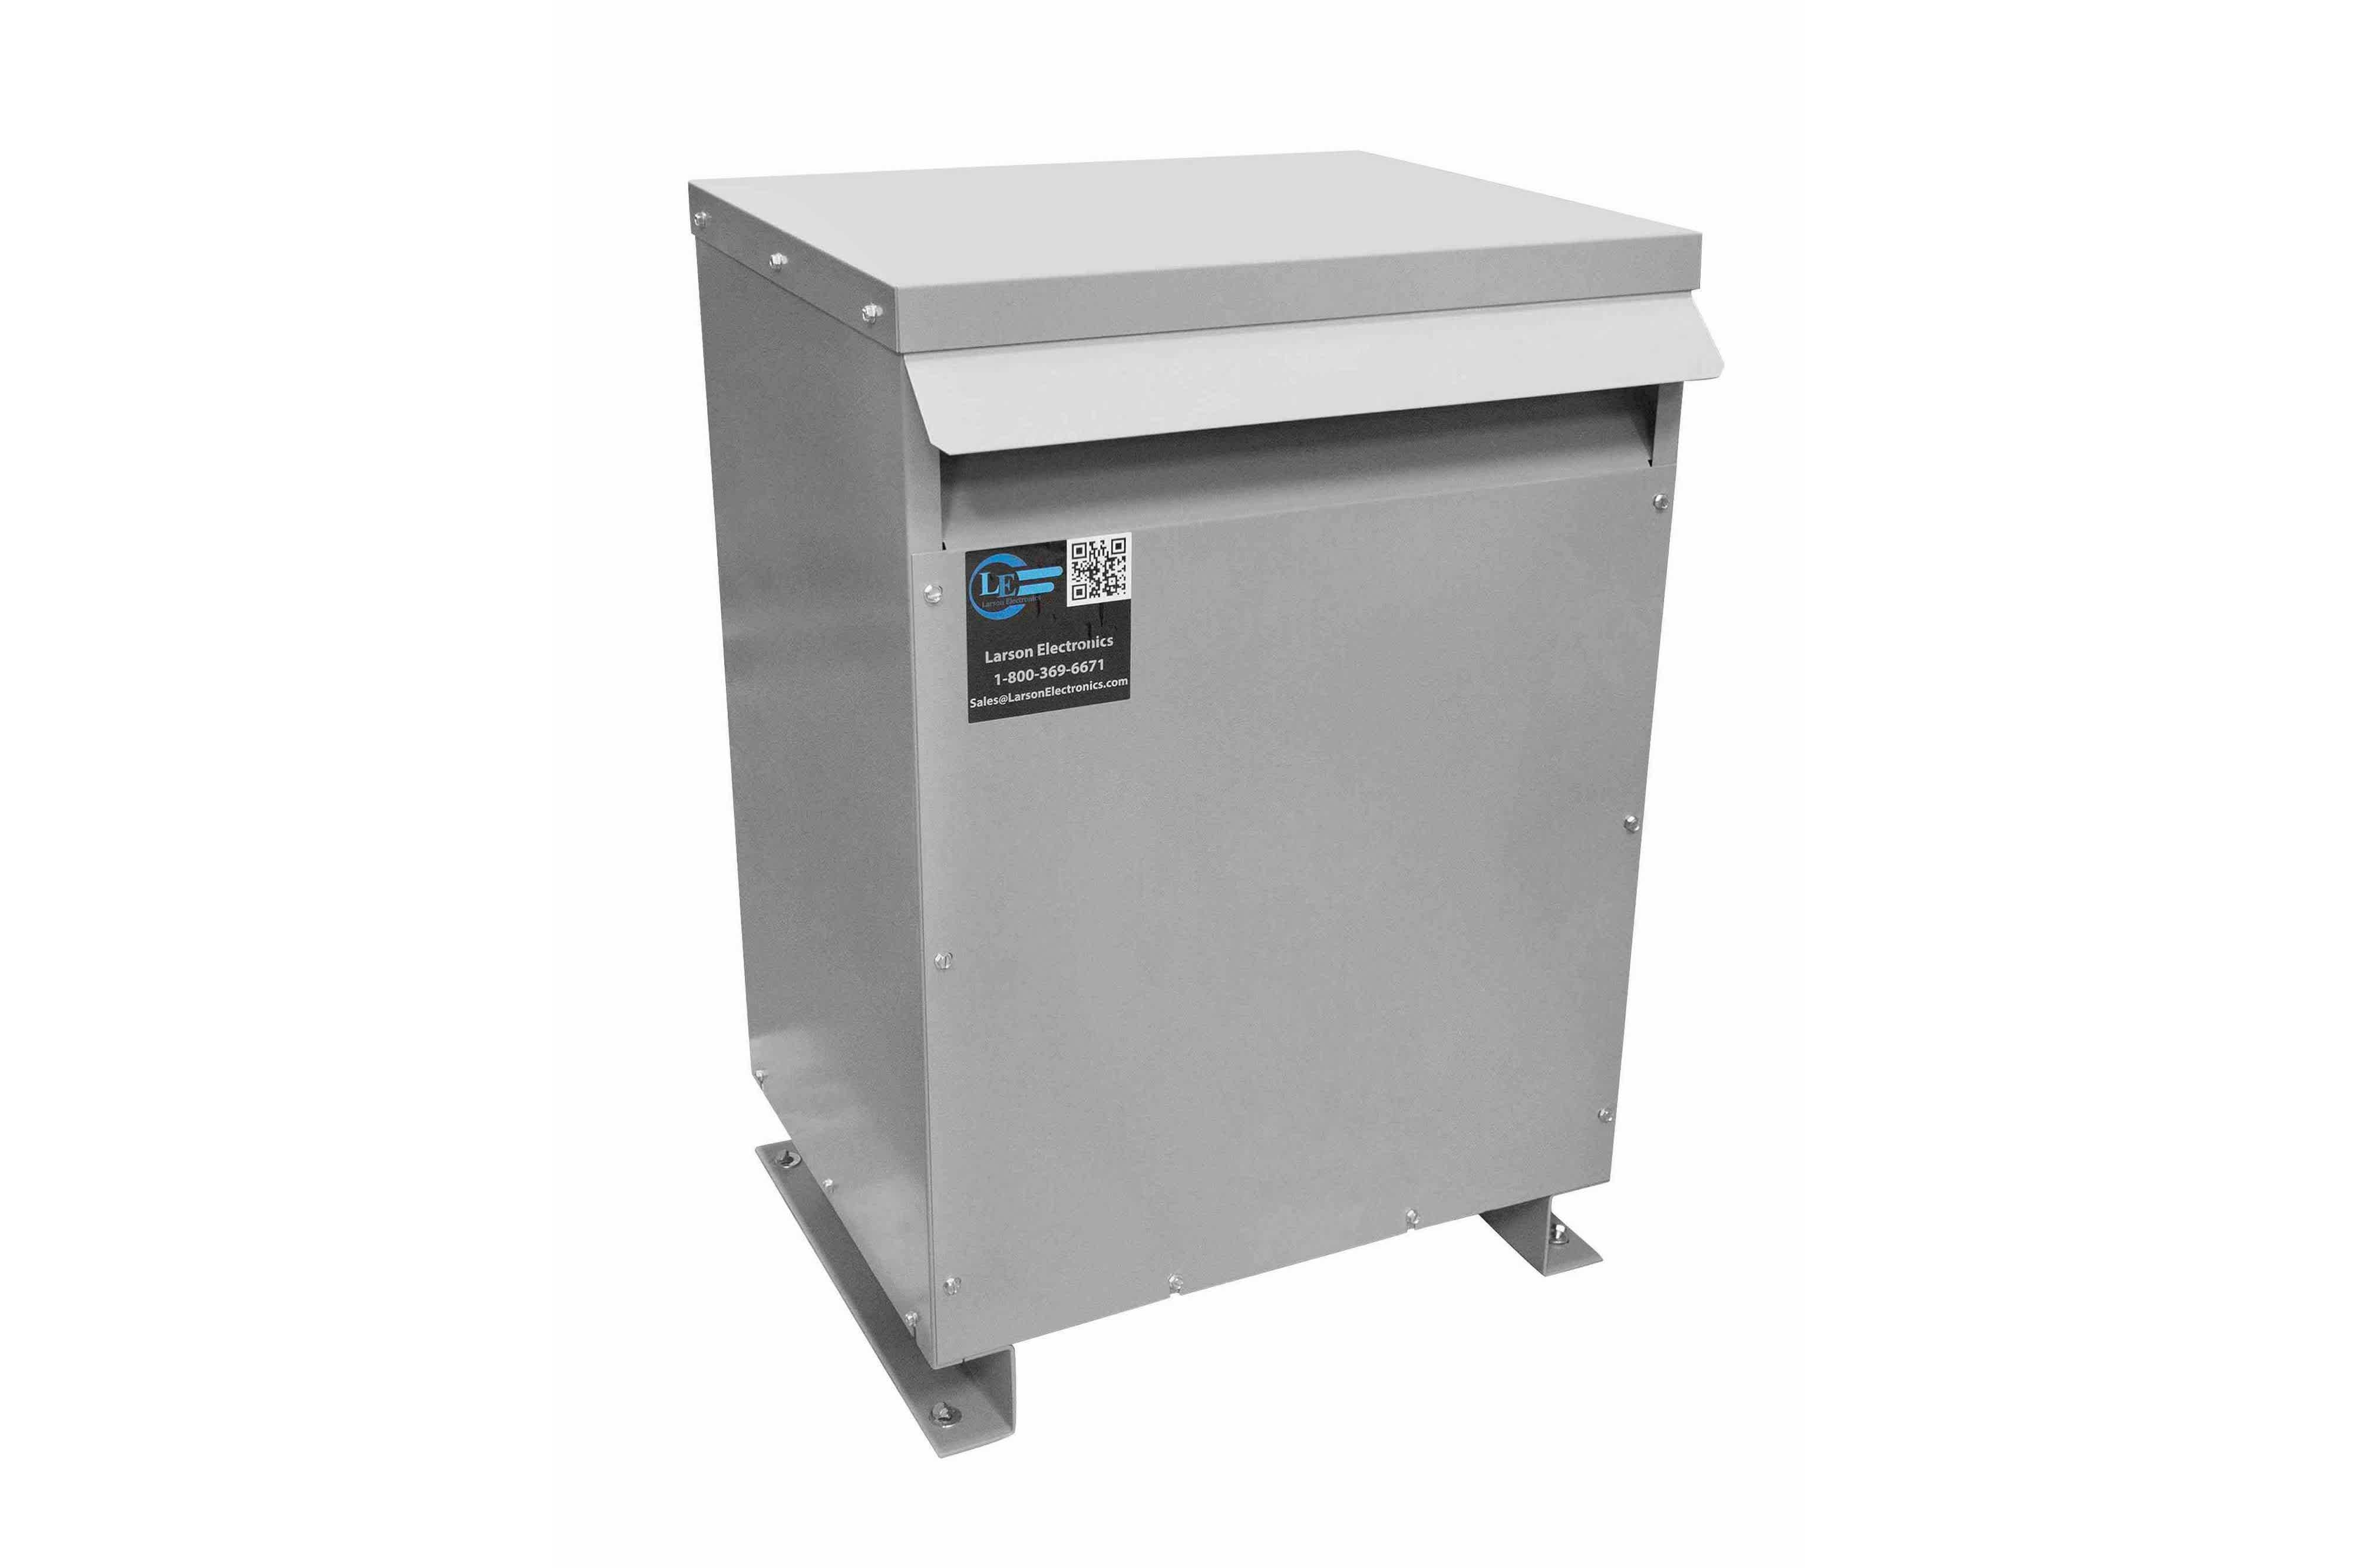 137.5 kVA 3PH Isolation Transformer, 415V Wye Primary, 600Y/347 Wye-N Secondary, N3R, Ventilated, 60 Hz